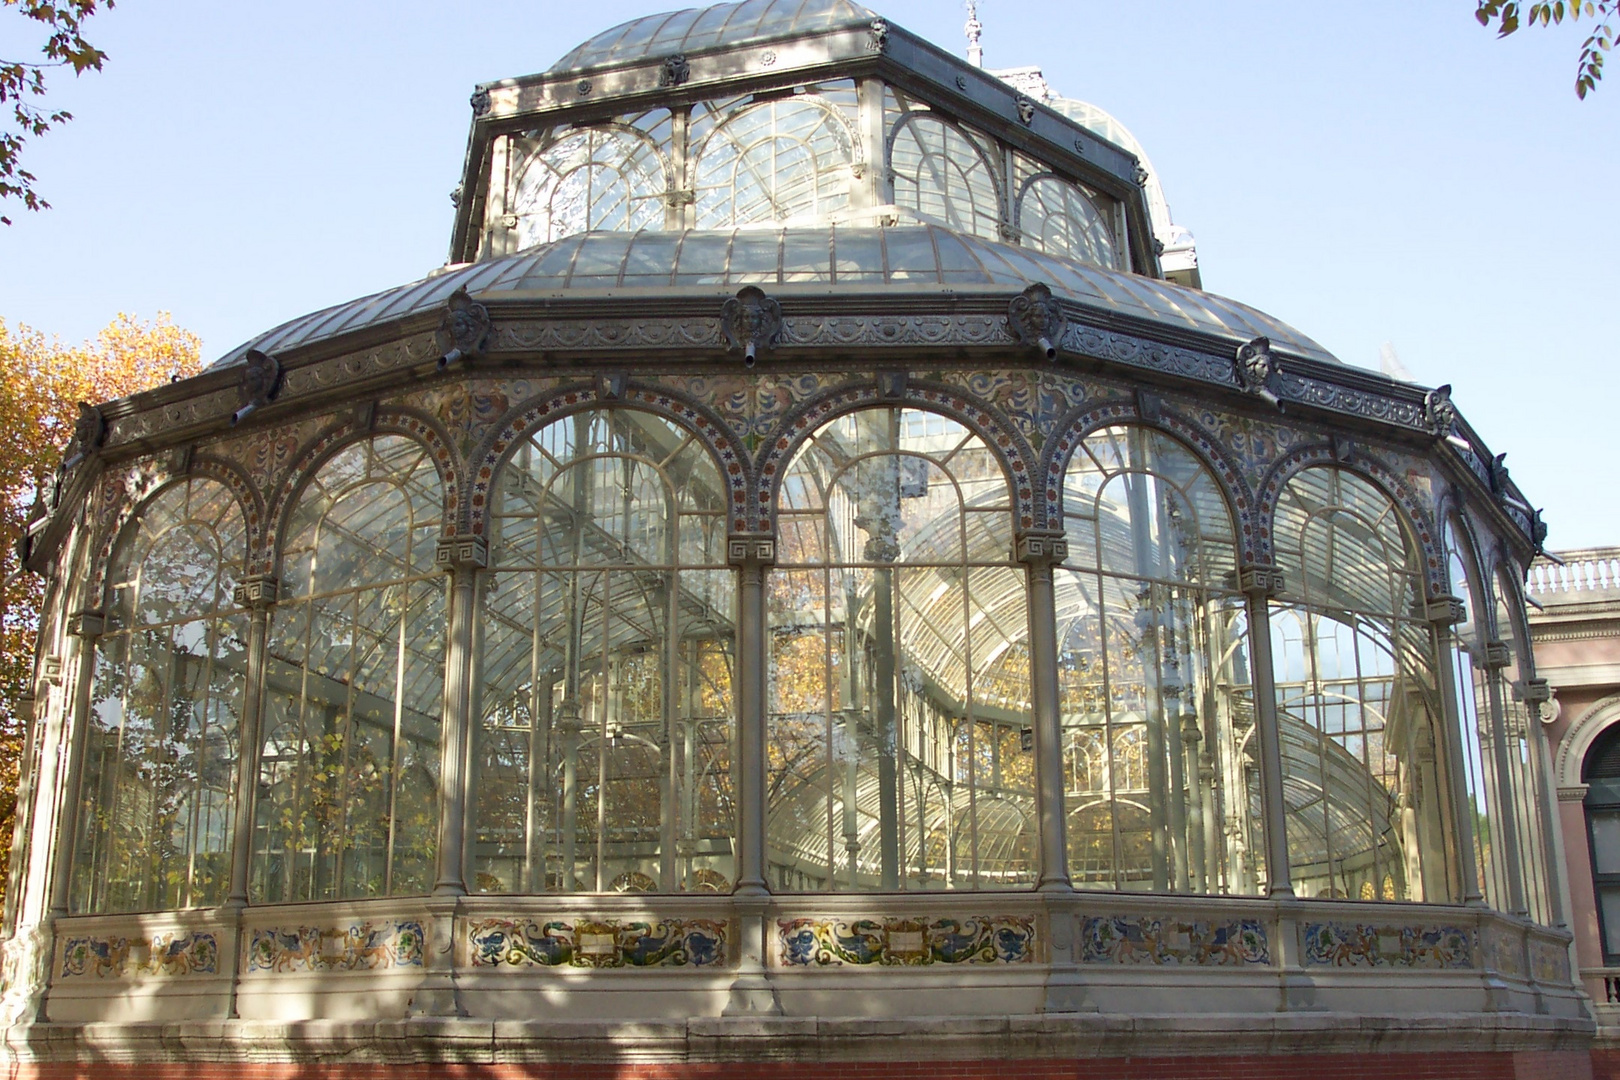 Palacio de Cristal (detalle)